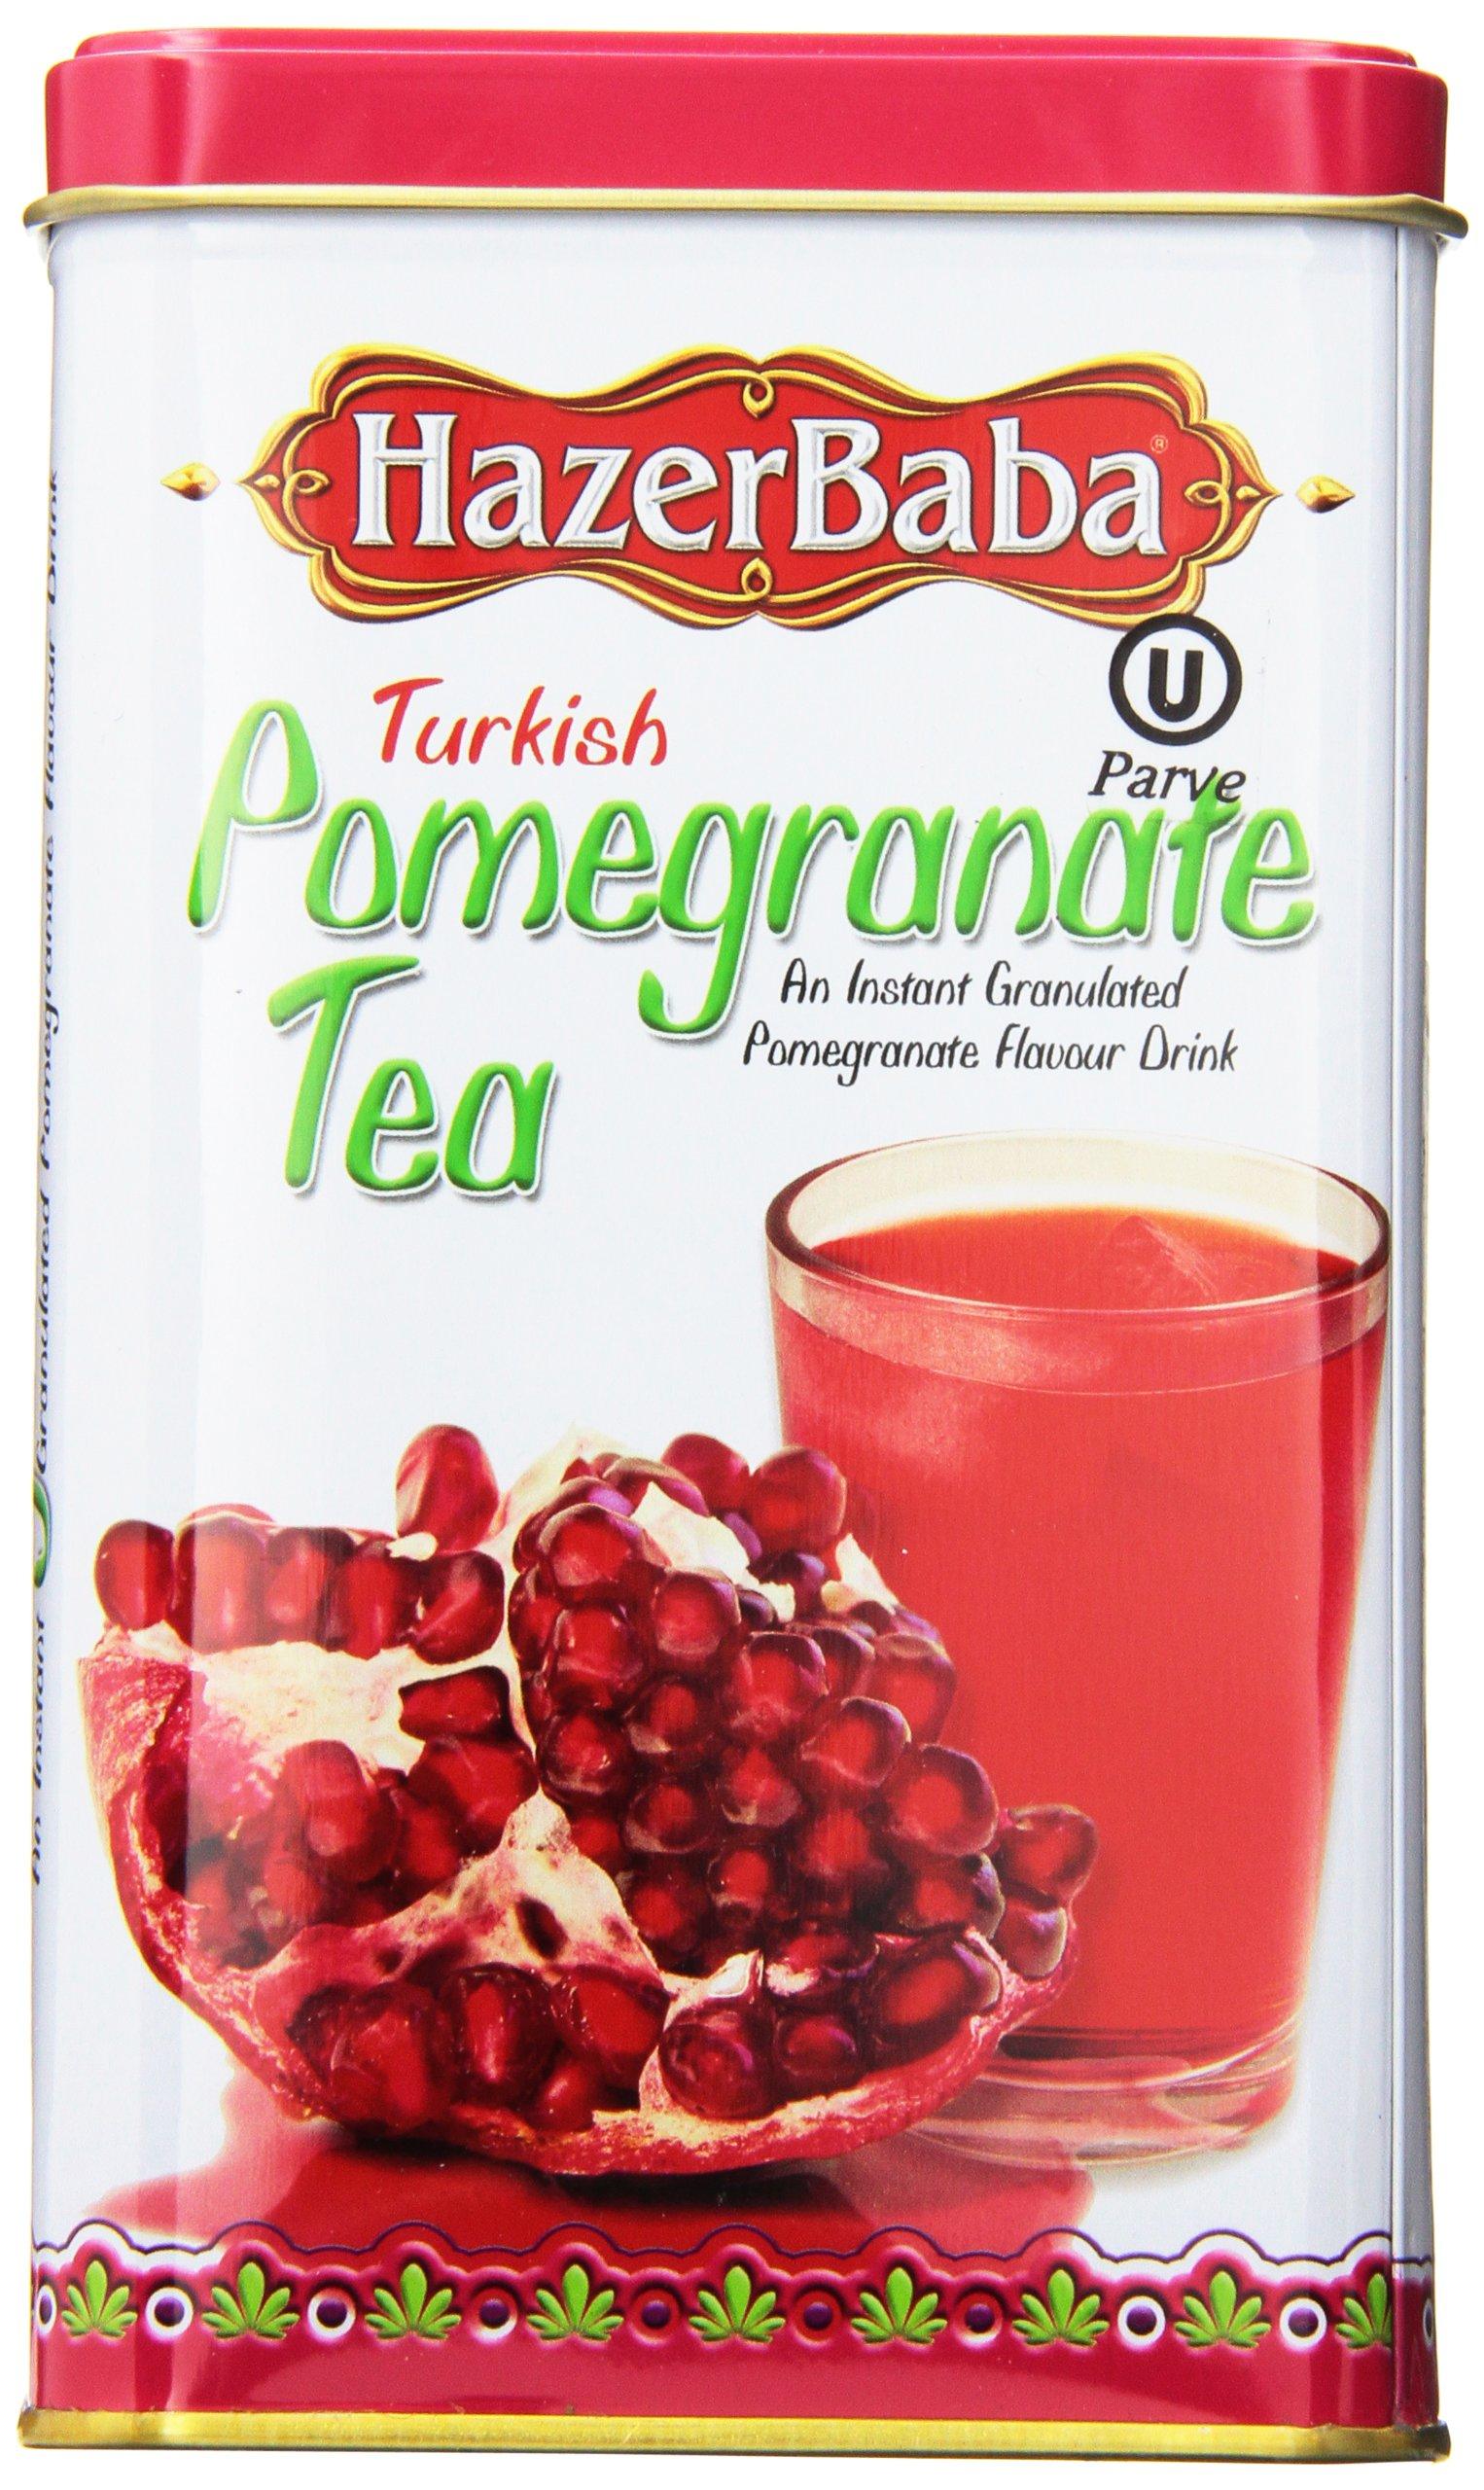 Hazer Baba Turkish Pomegranate Tea, 8.8 Ounce